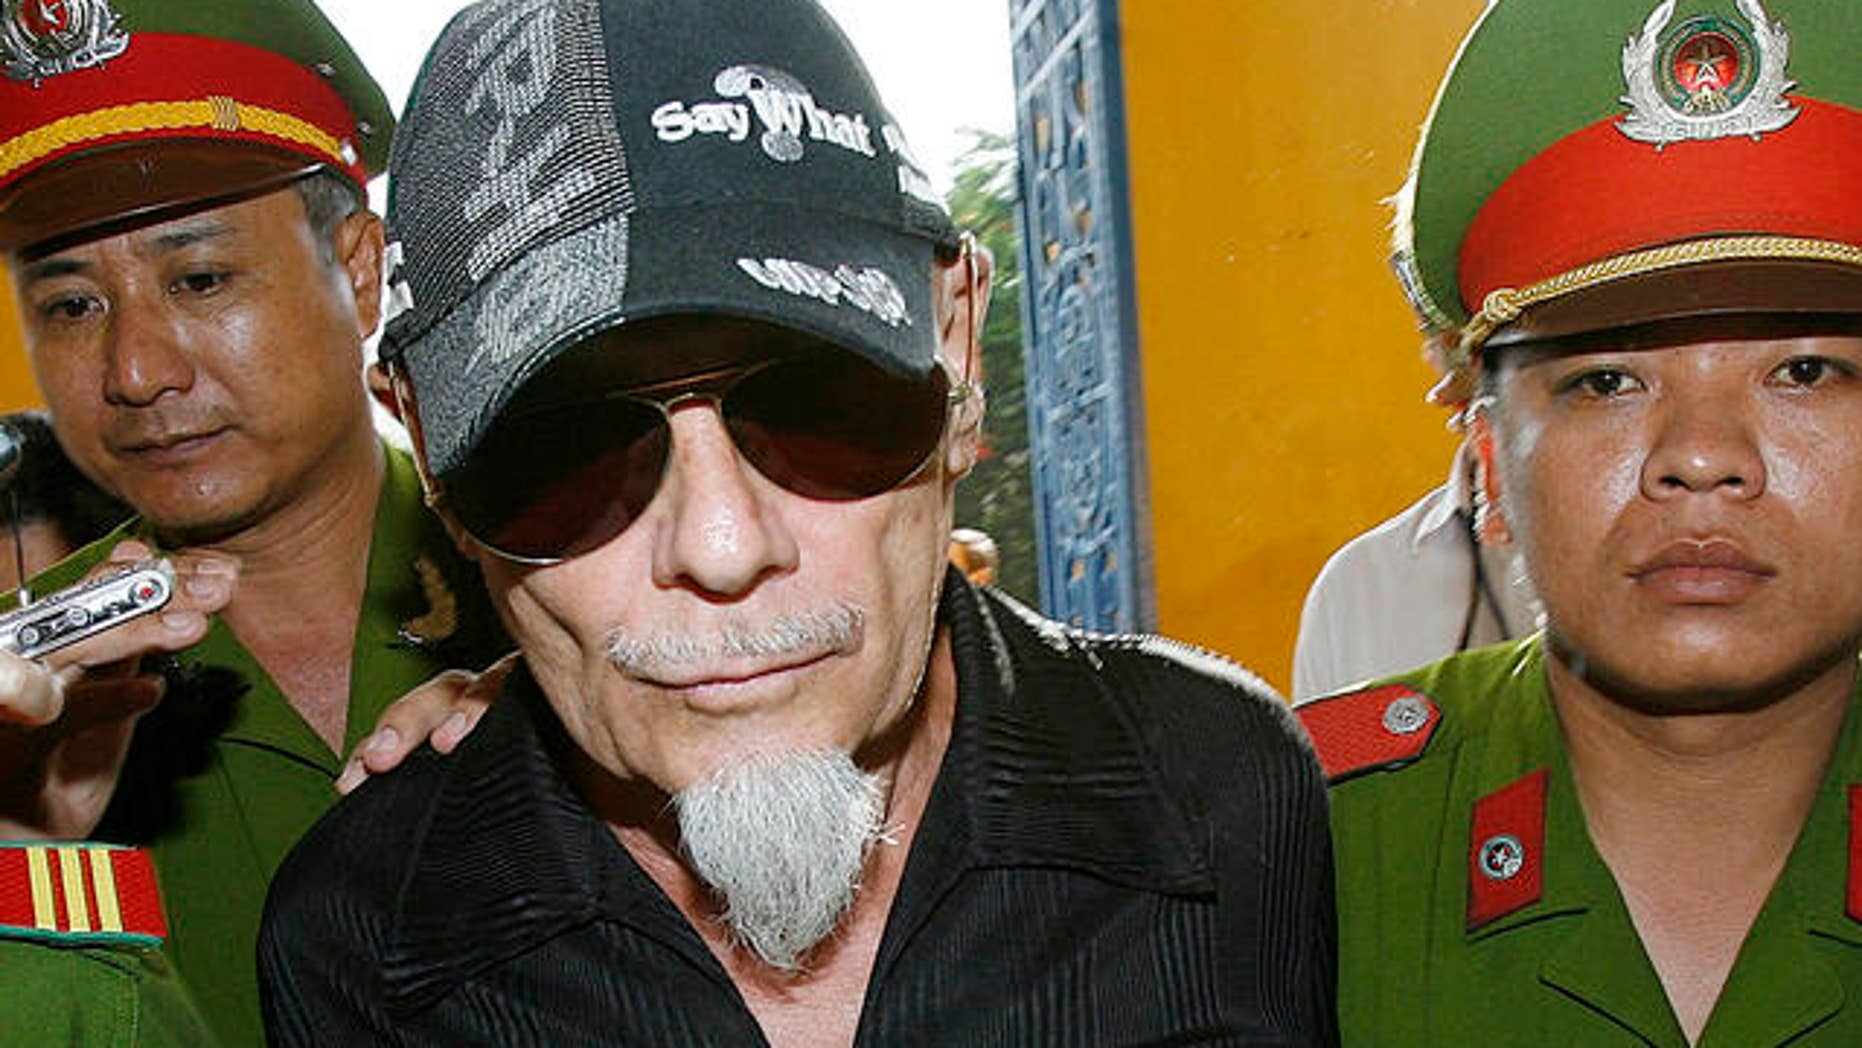 2006: Gary Glitter, former British rock singer, is led into court, Ho Chi Minh city, Vietnam. (AP)